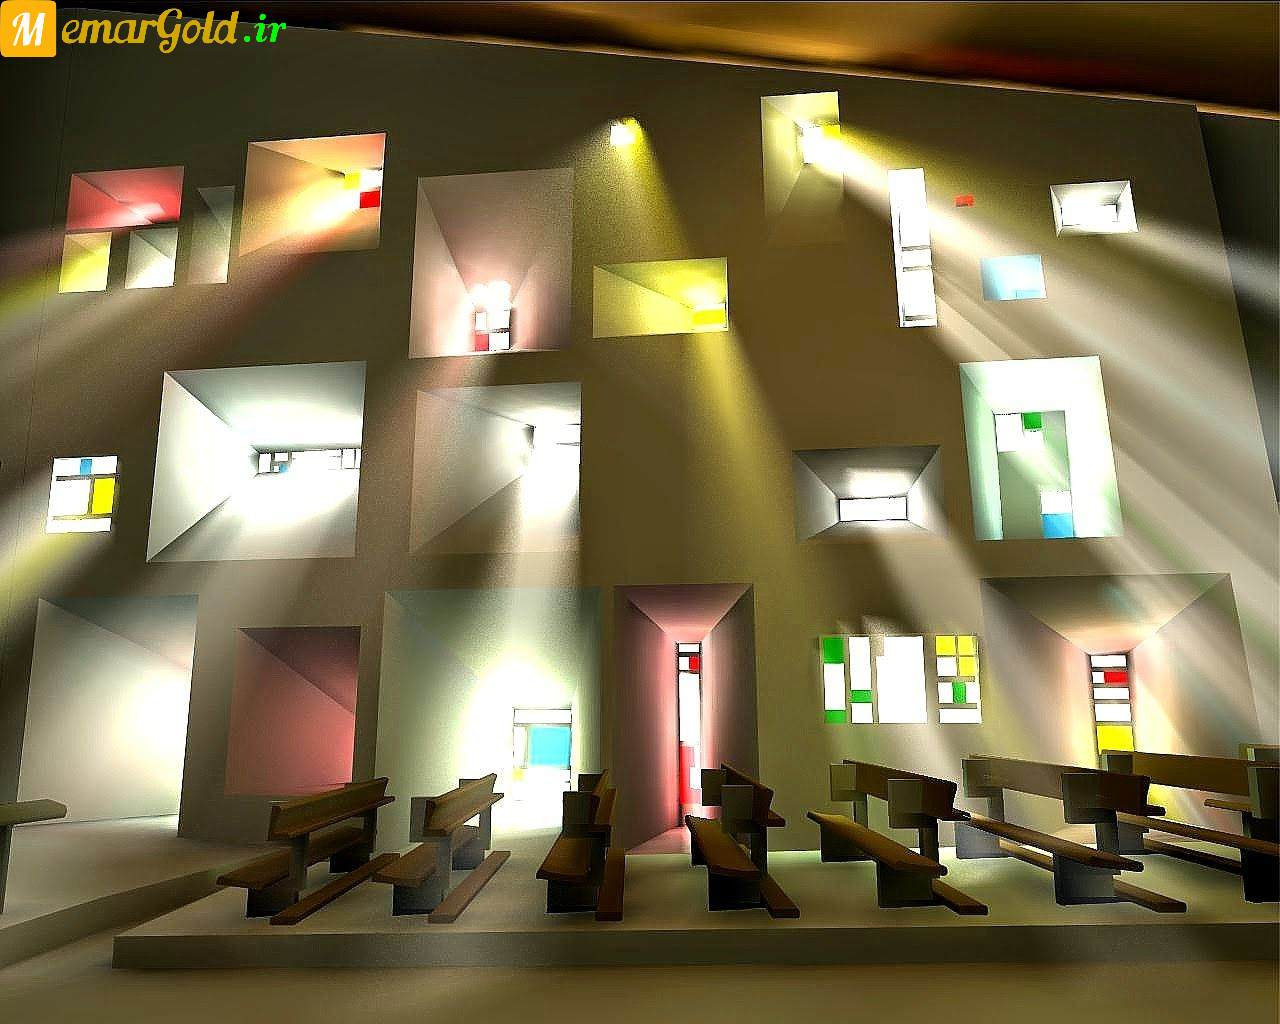 نورپردازی کلیسای رونشان